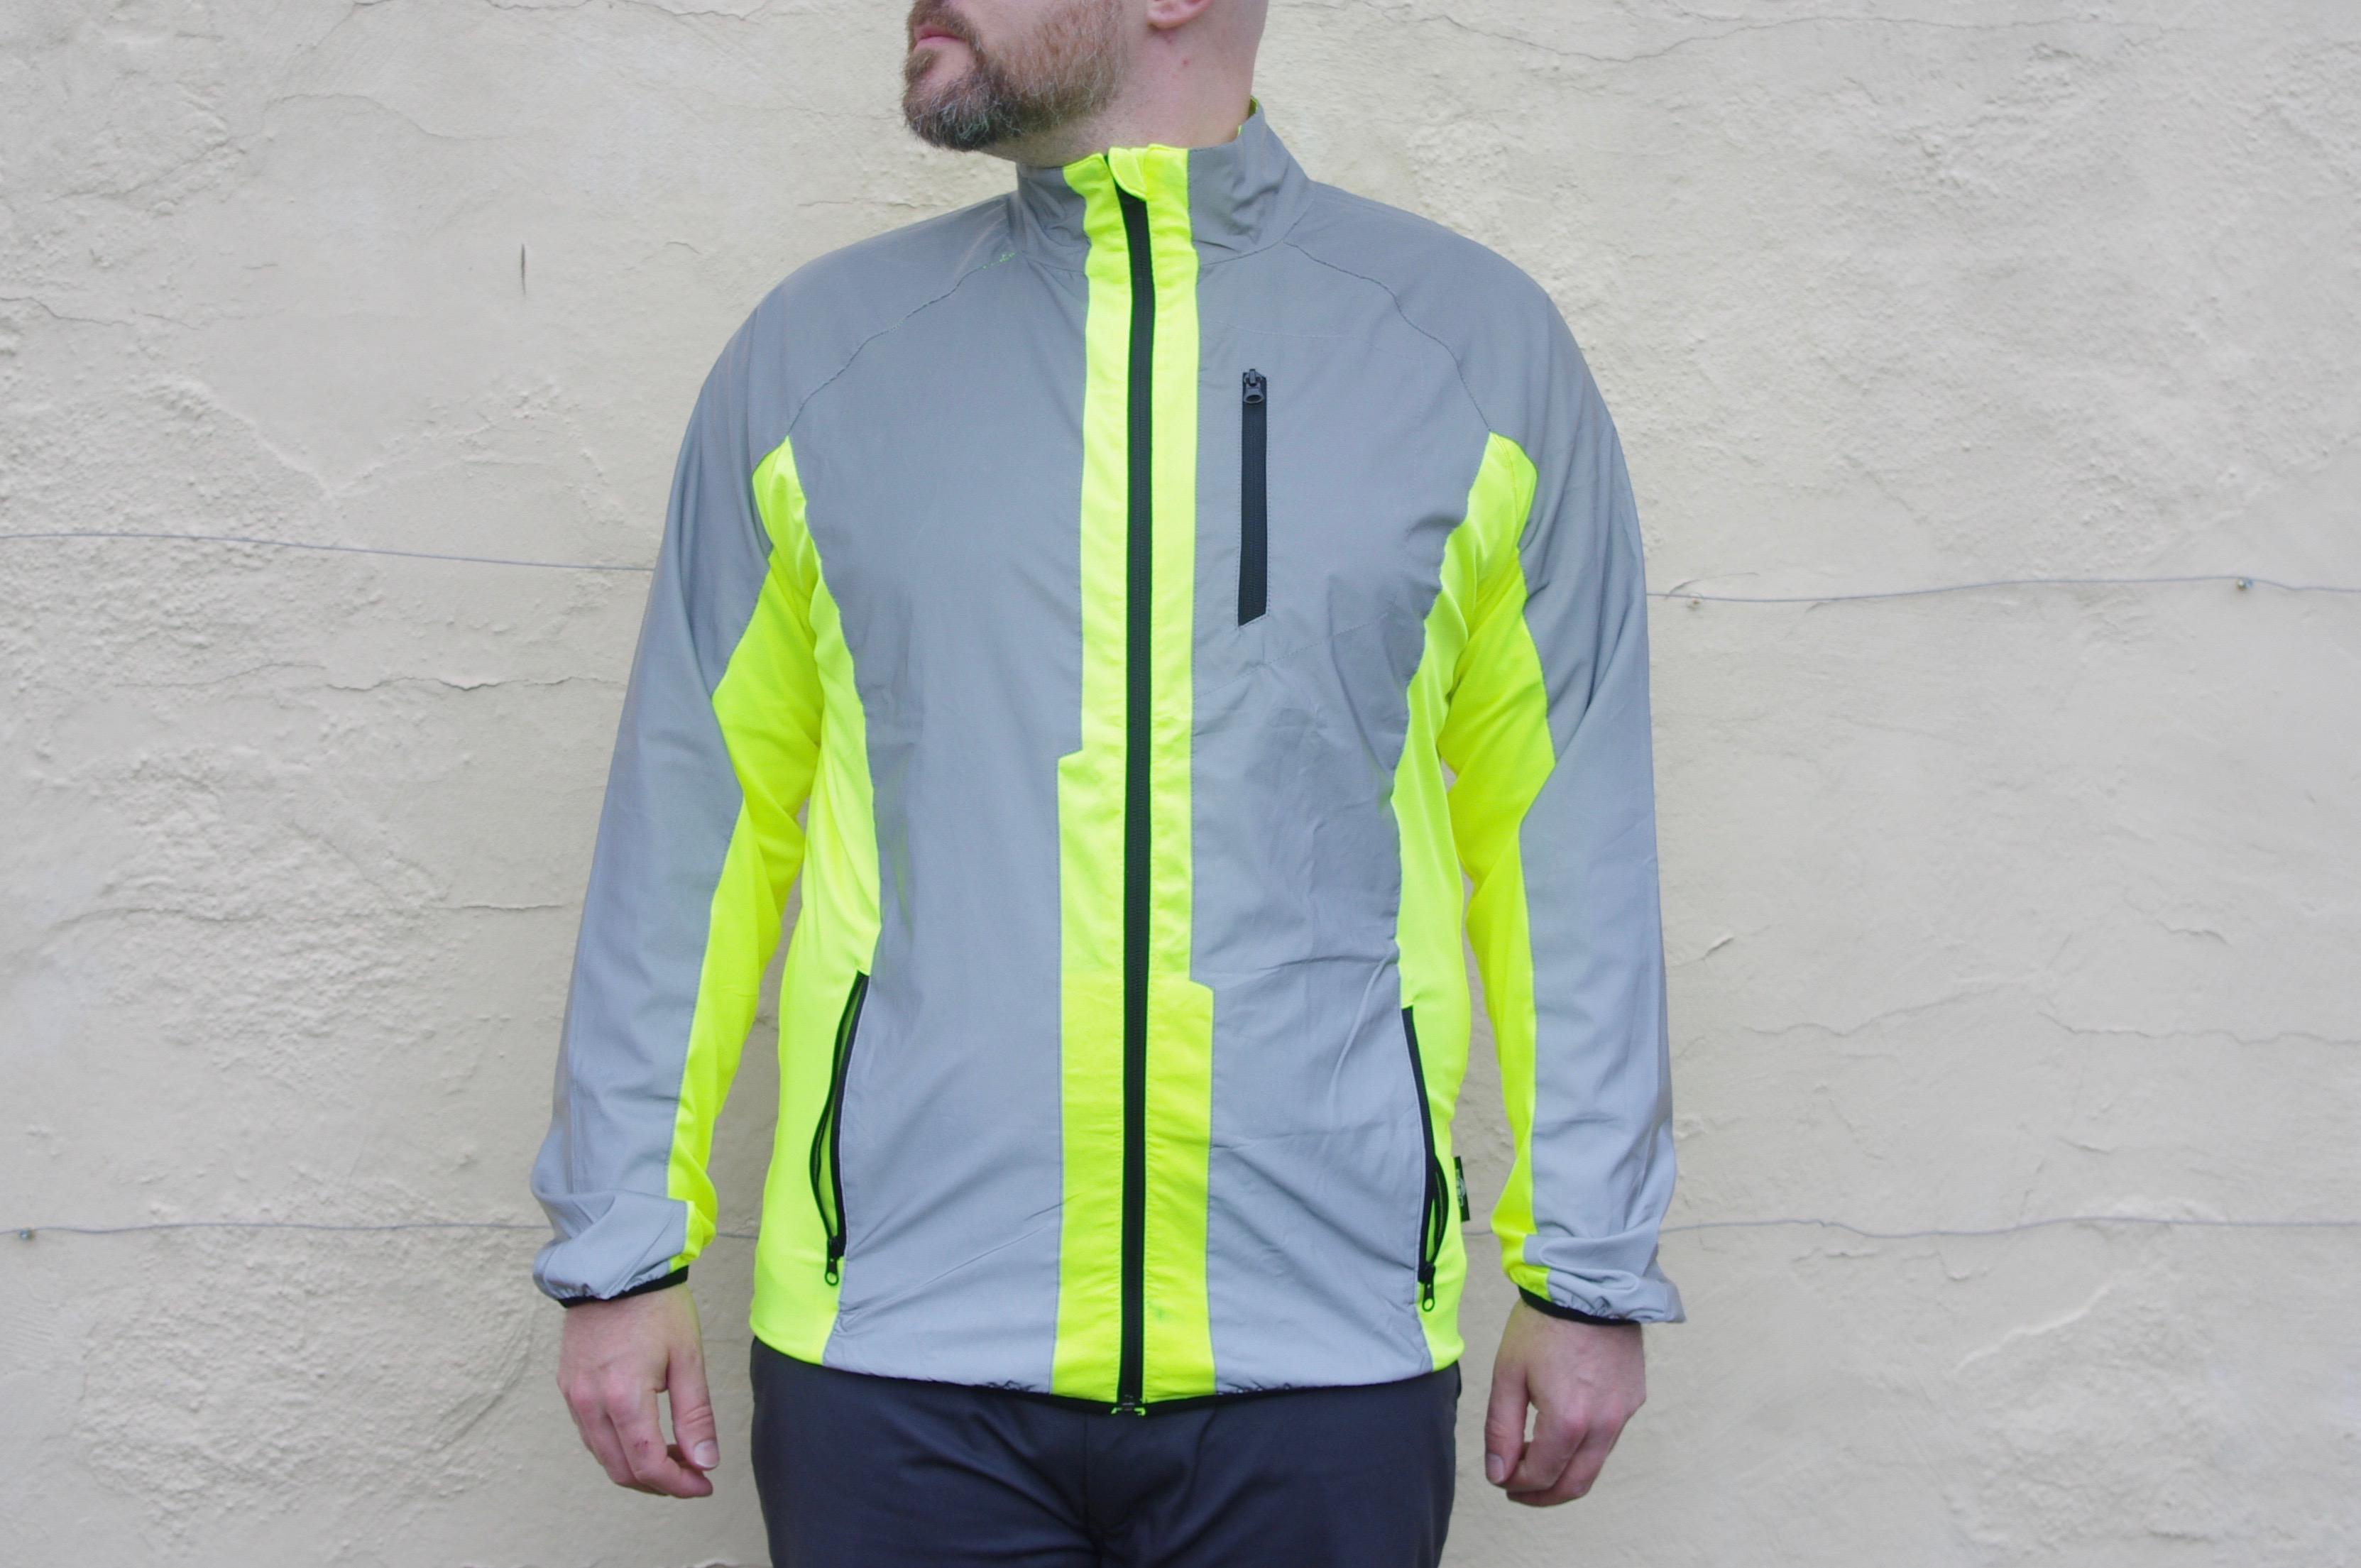 running Waterproof reflective high visibility cycling jacket riding